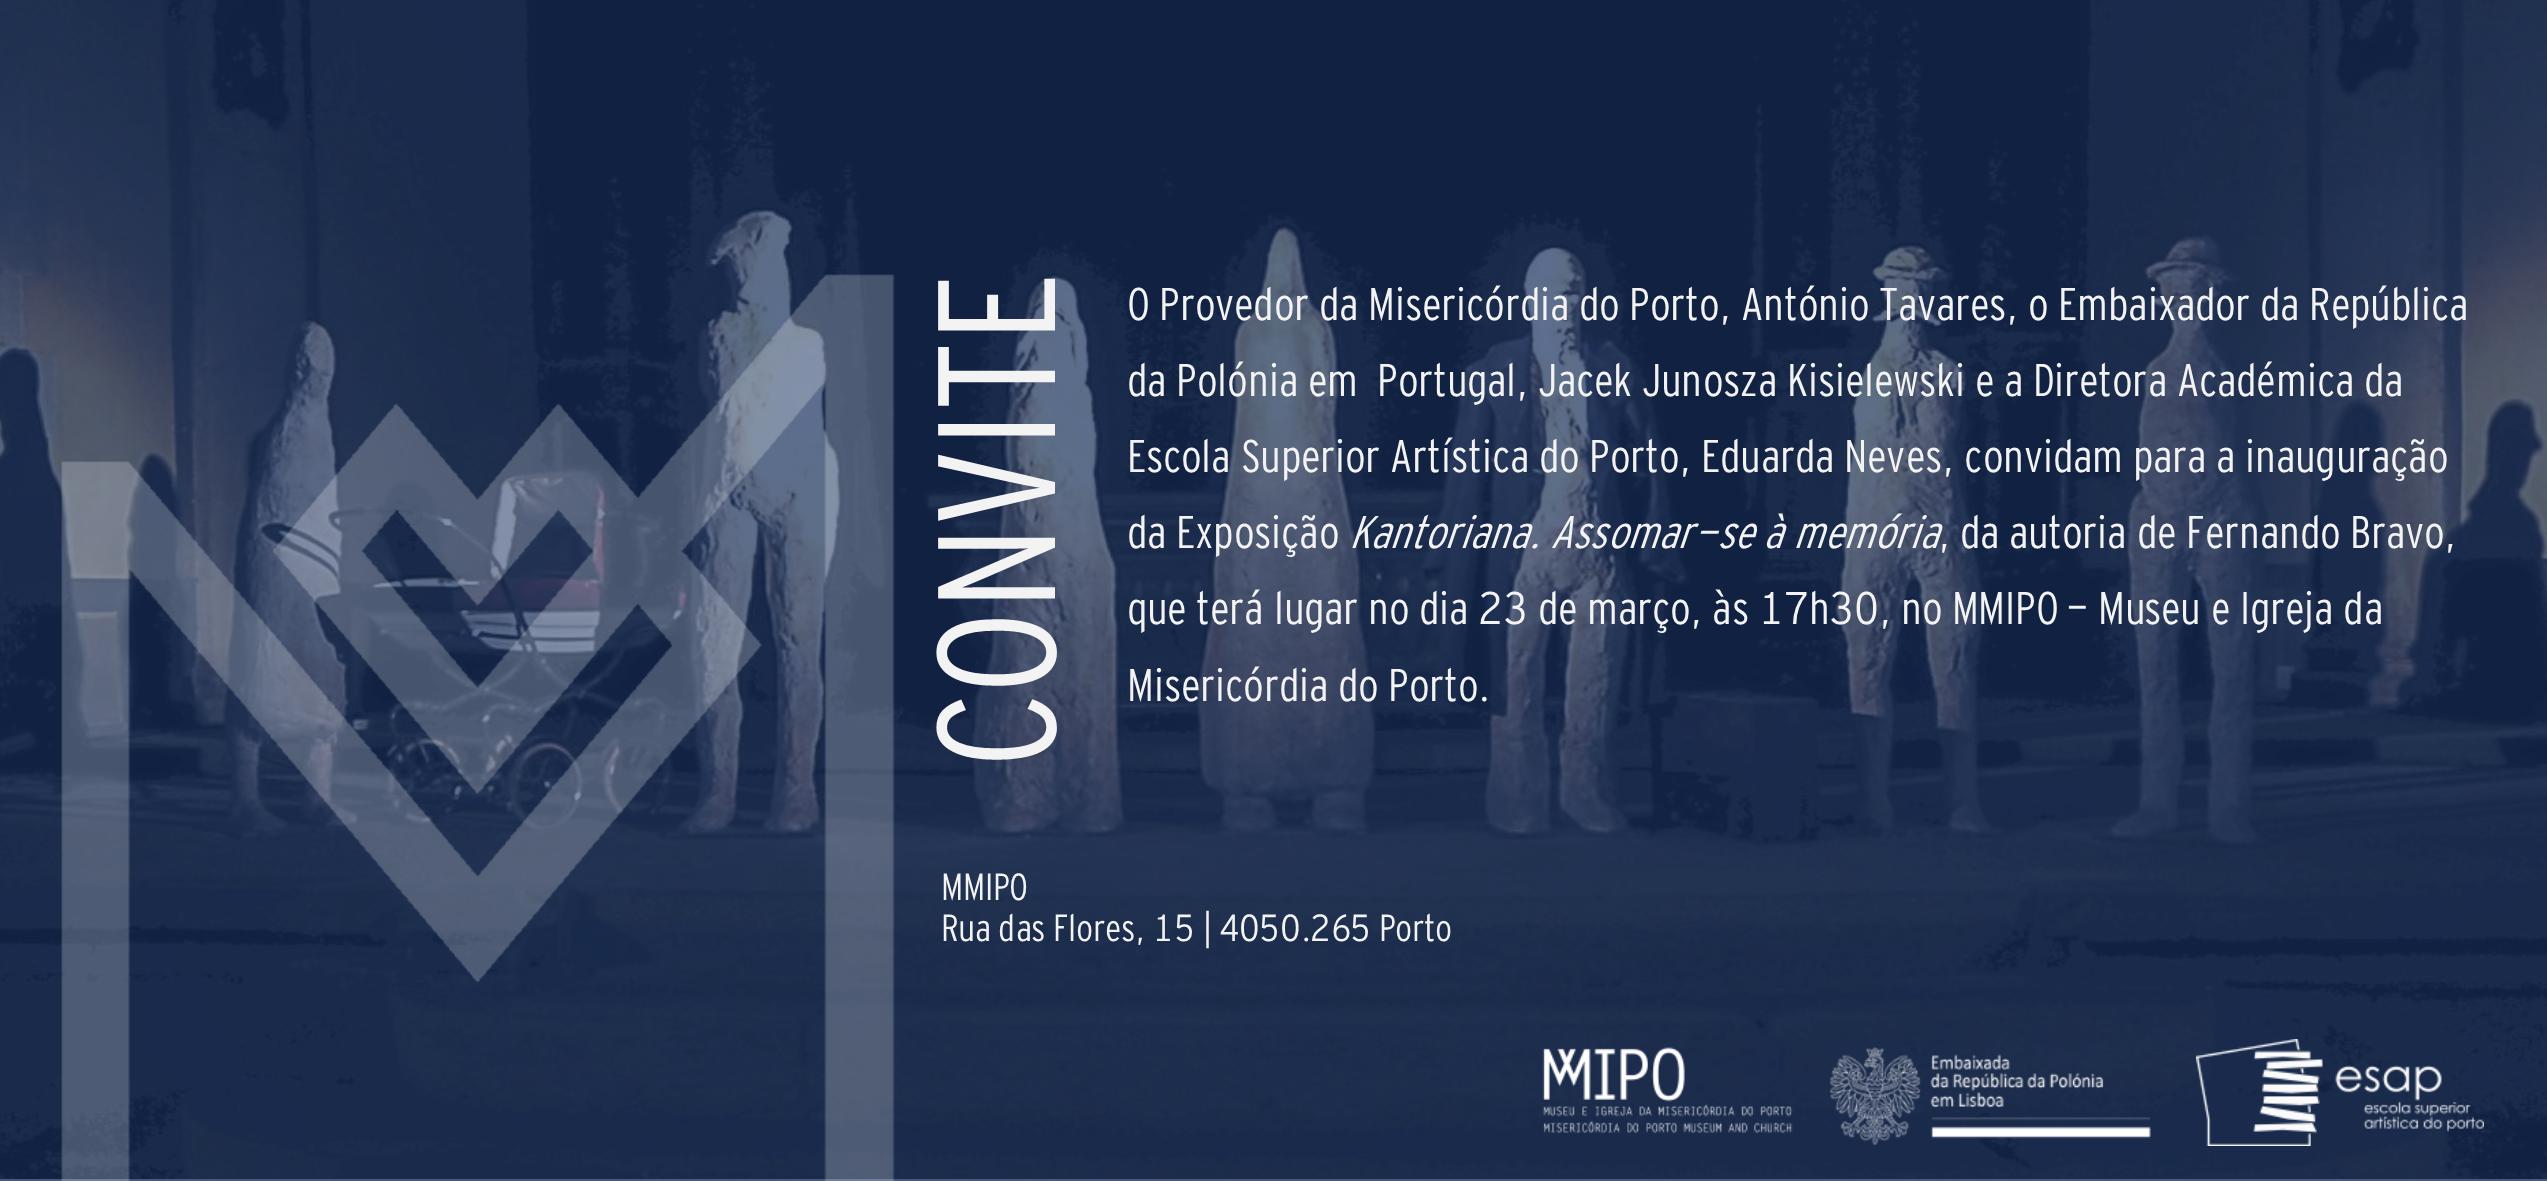 https://www.scmp.pt/assets/misc/img/noticias/2017/2017-03-23%20Kantoriana/Convite%202017-03-18%20v1.png